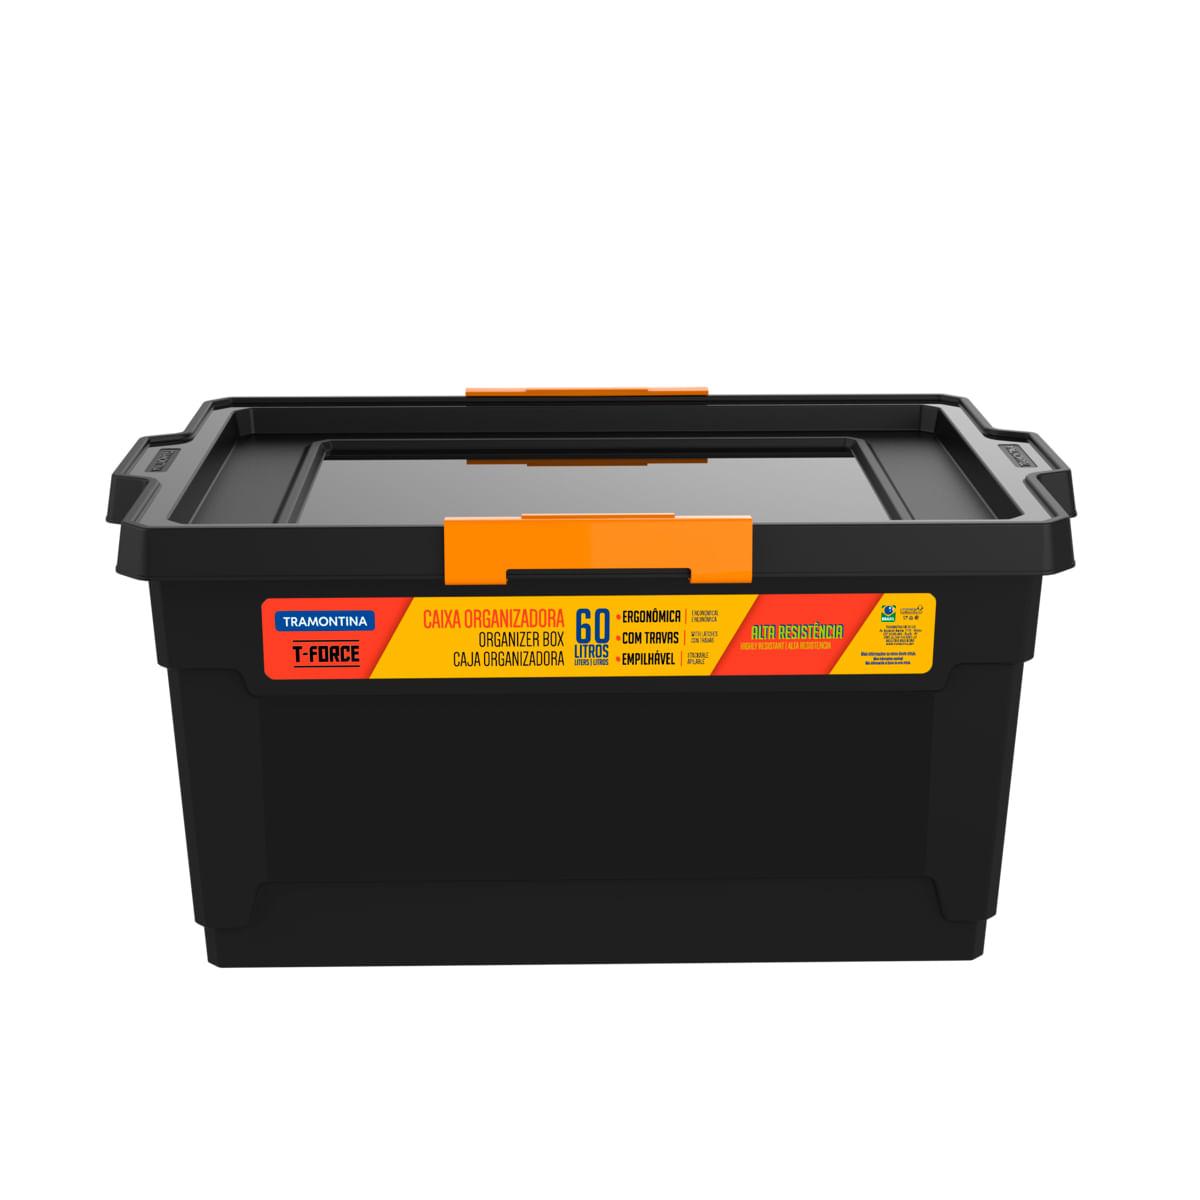 Caixa Organizadora Tramontina T-Force 60L em Polipropileno Preto